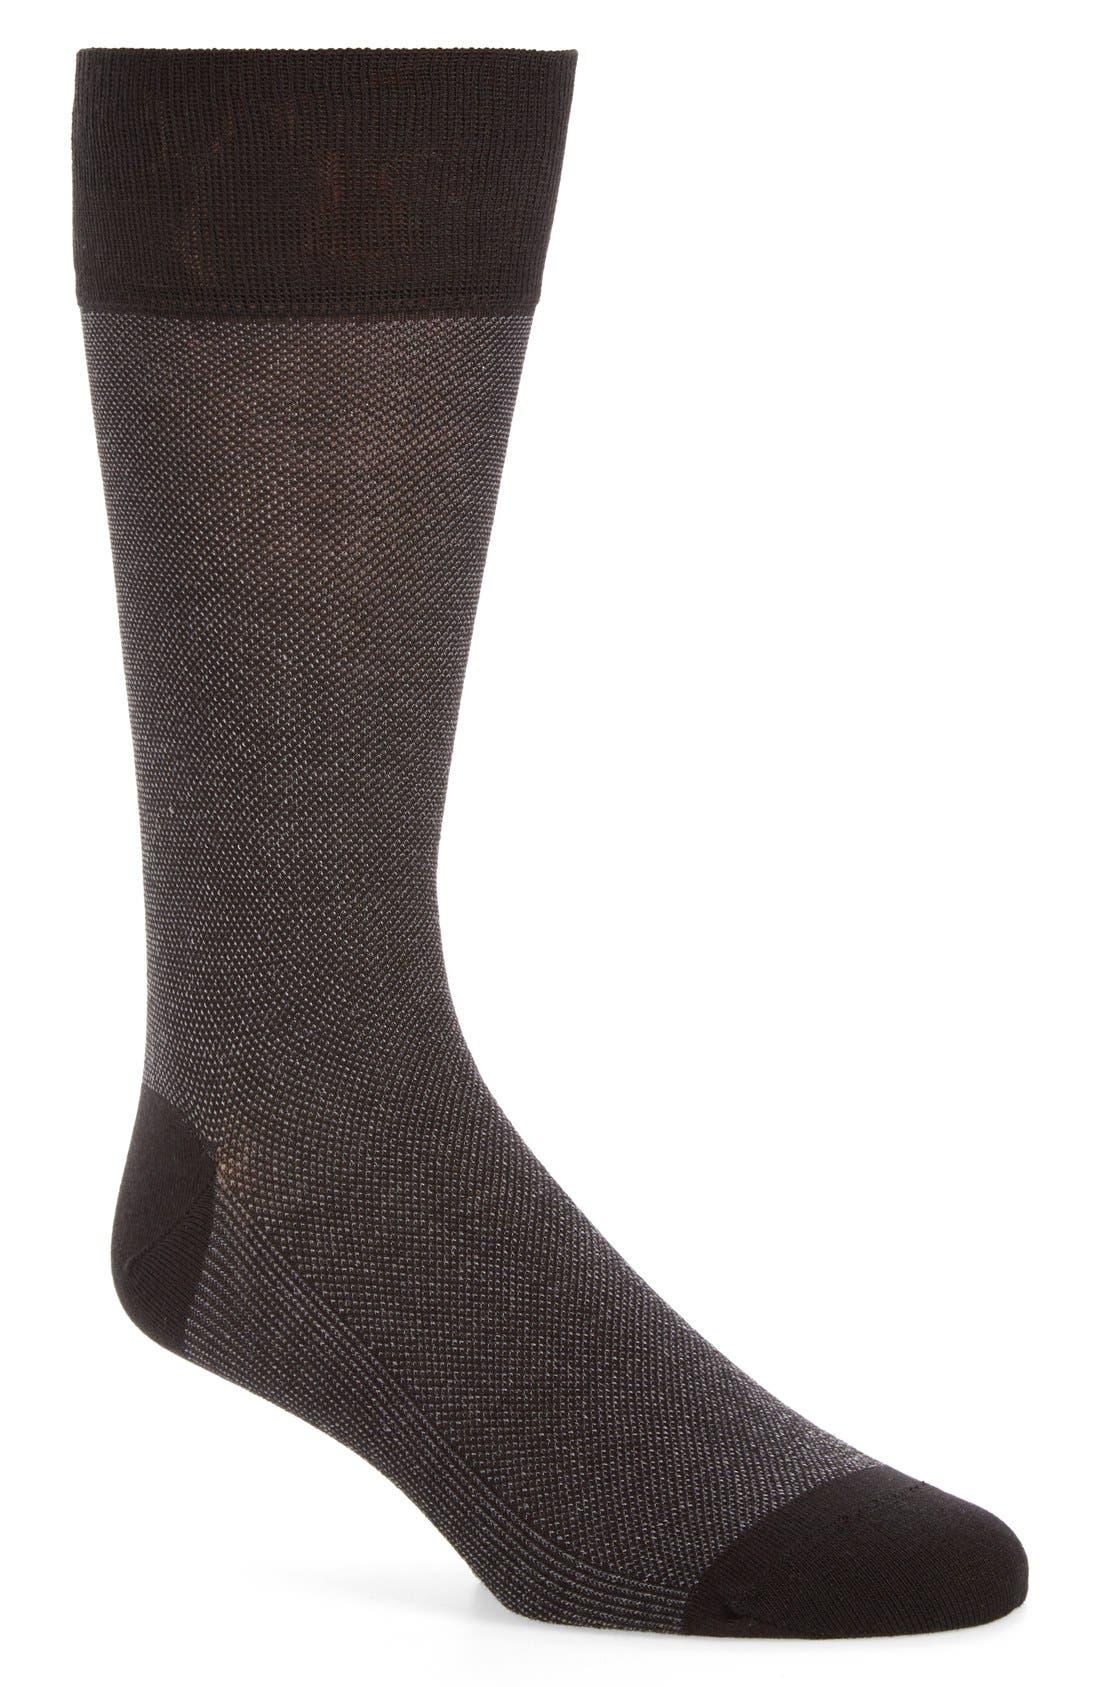 Piqué Texture Crew Socks,                             Main thumbnail 1, color,                             Black